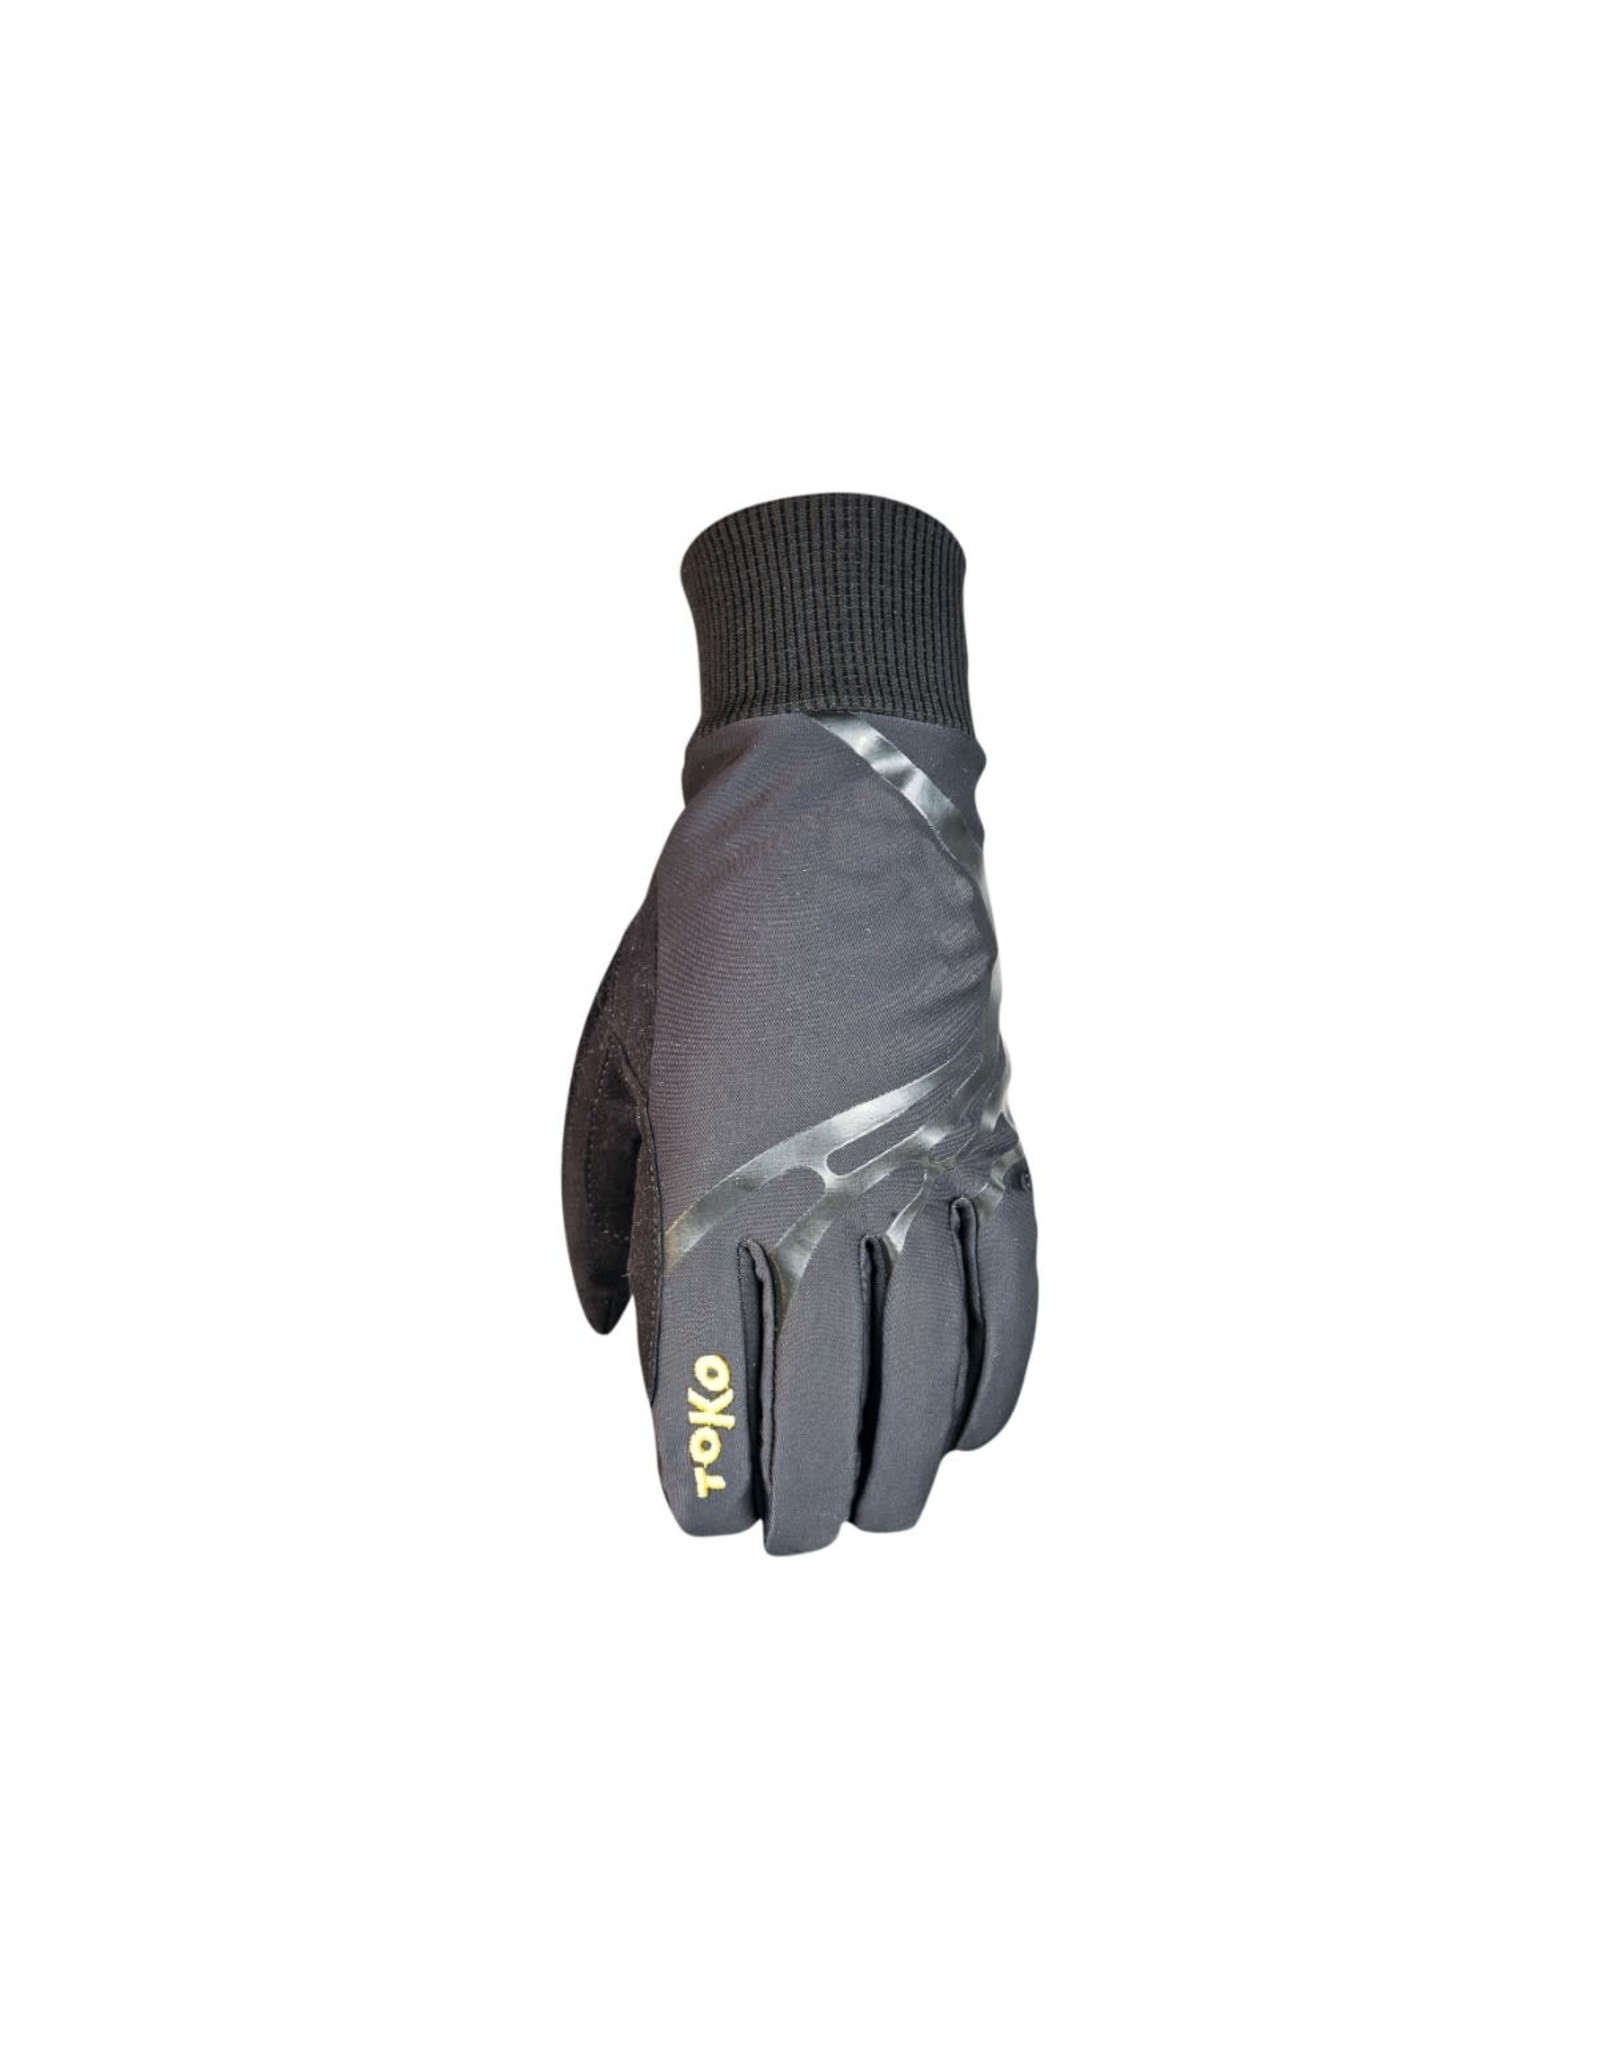 Toko Toko Classic Glove